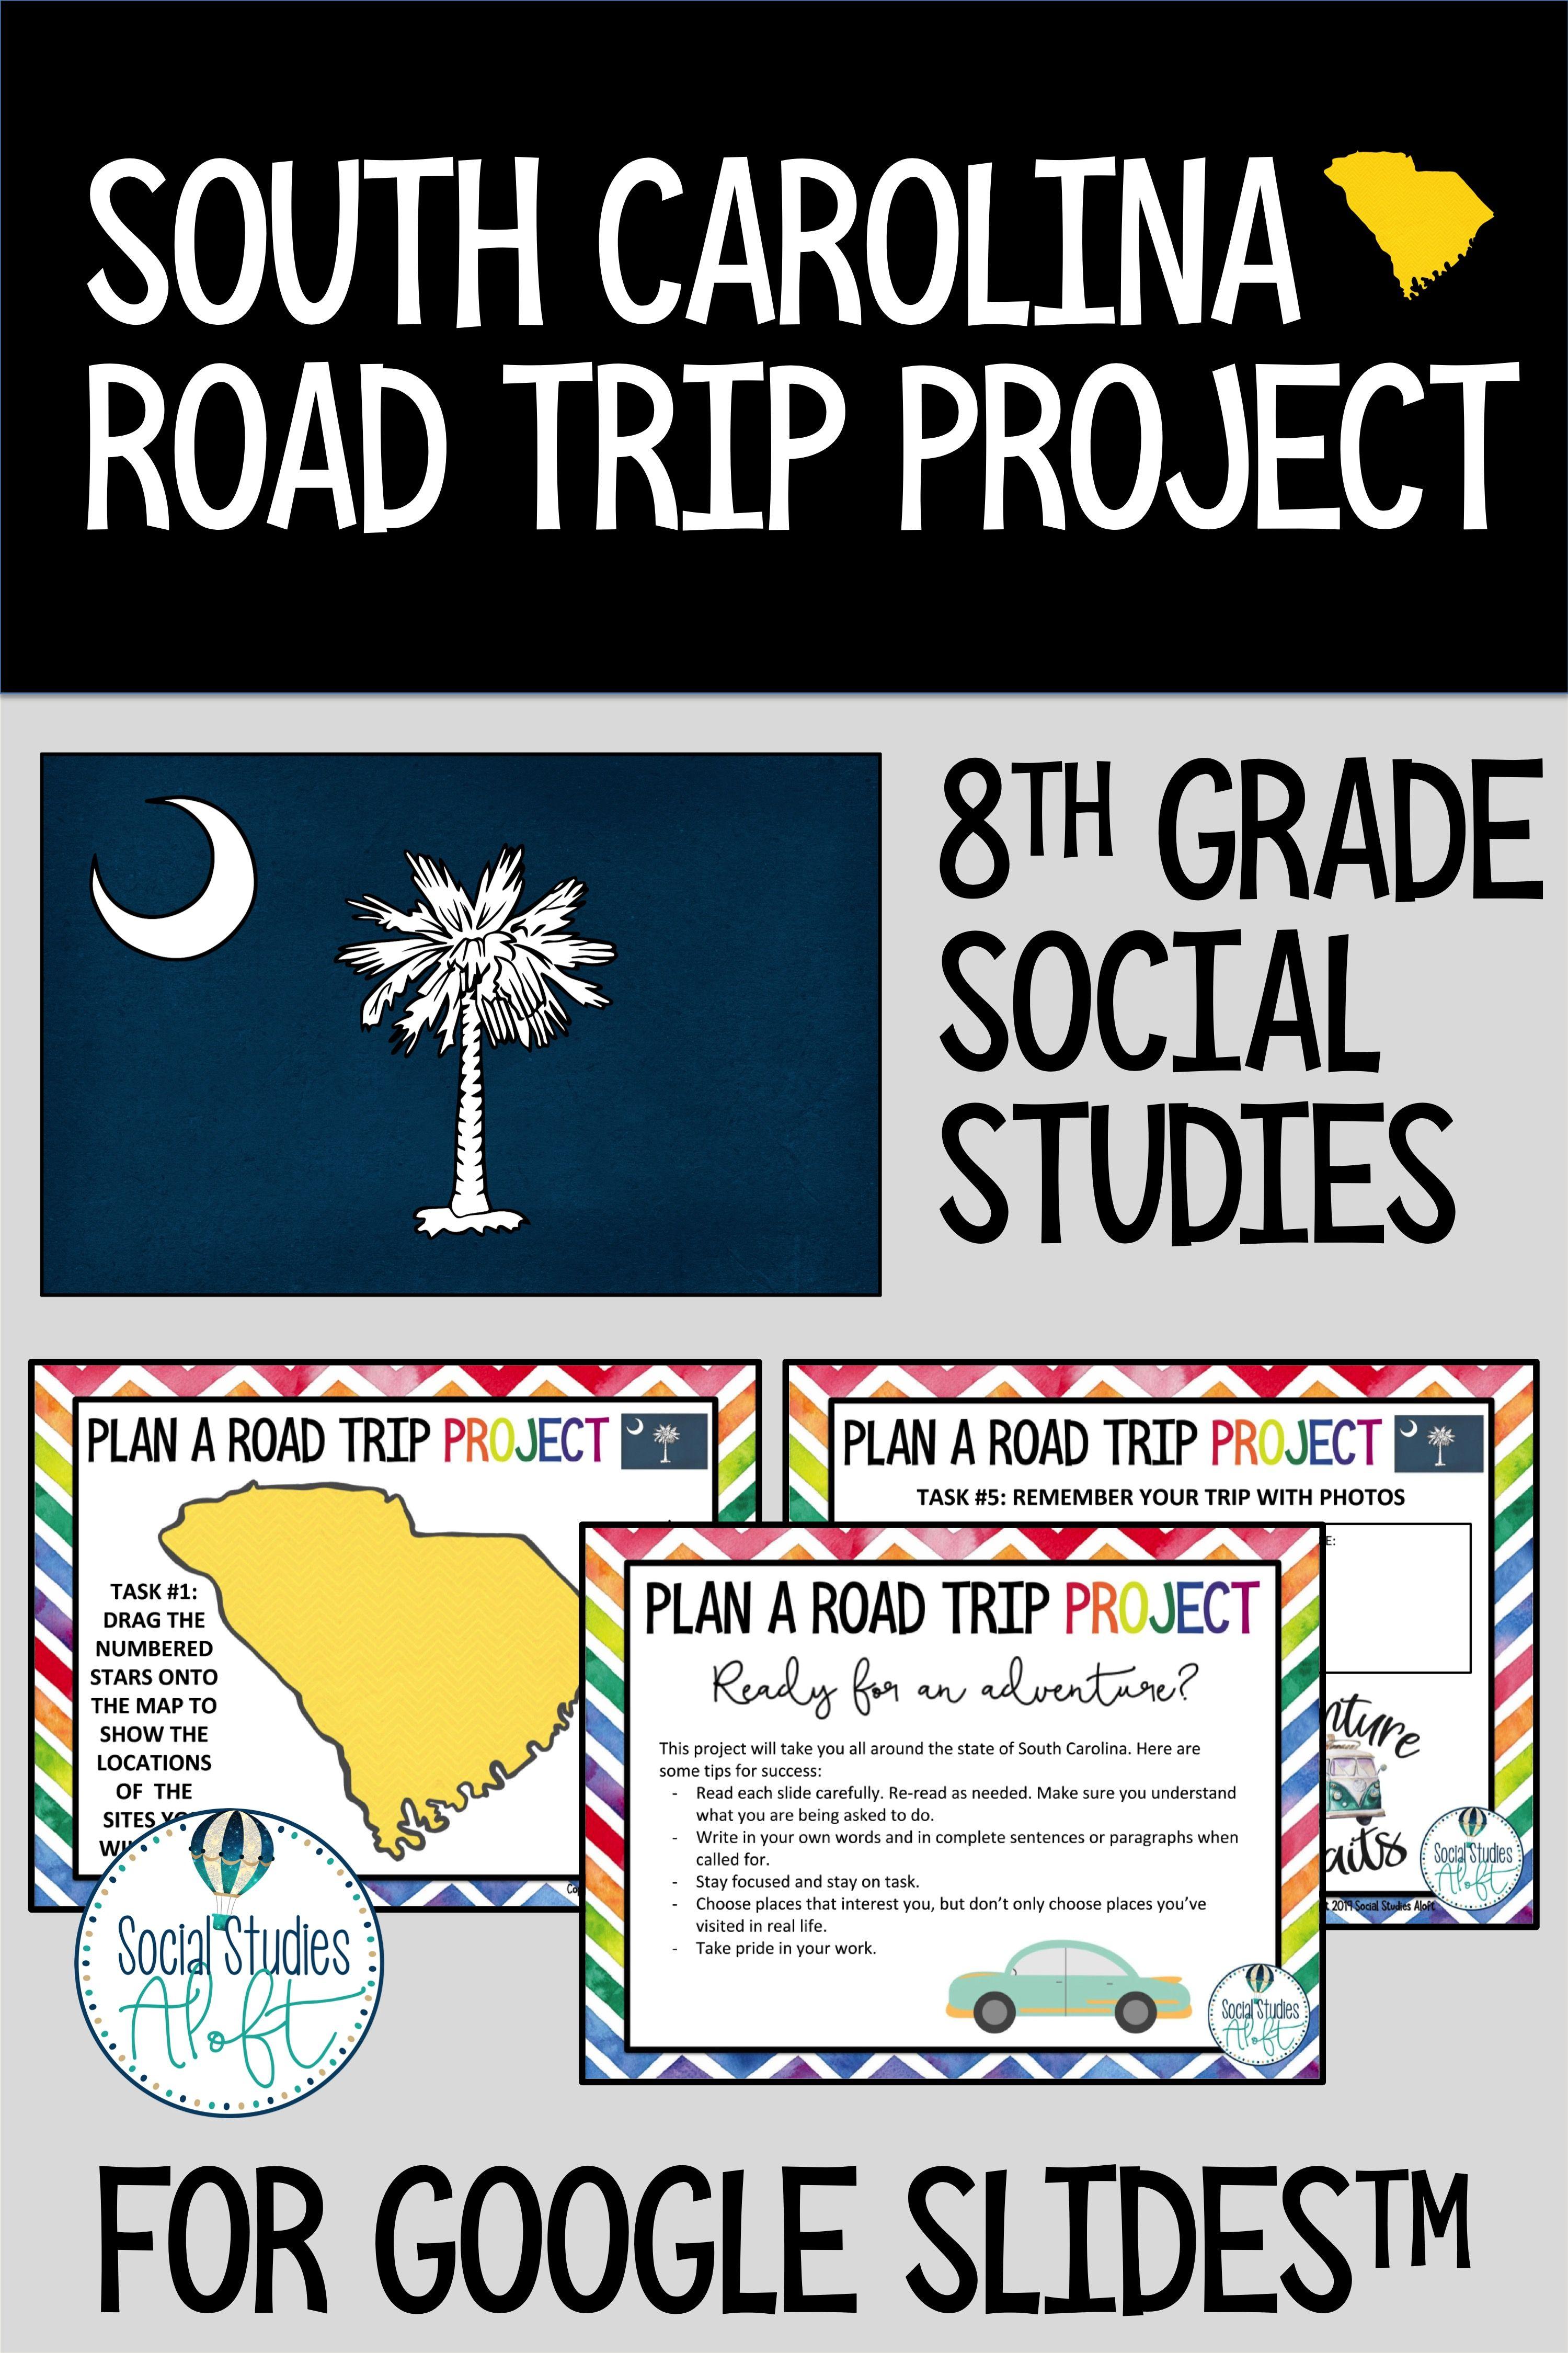 South Carolina Road Trip Project For 8th Grade